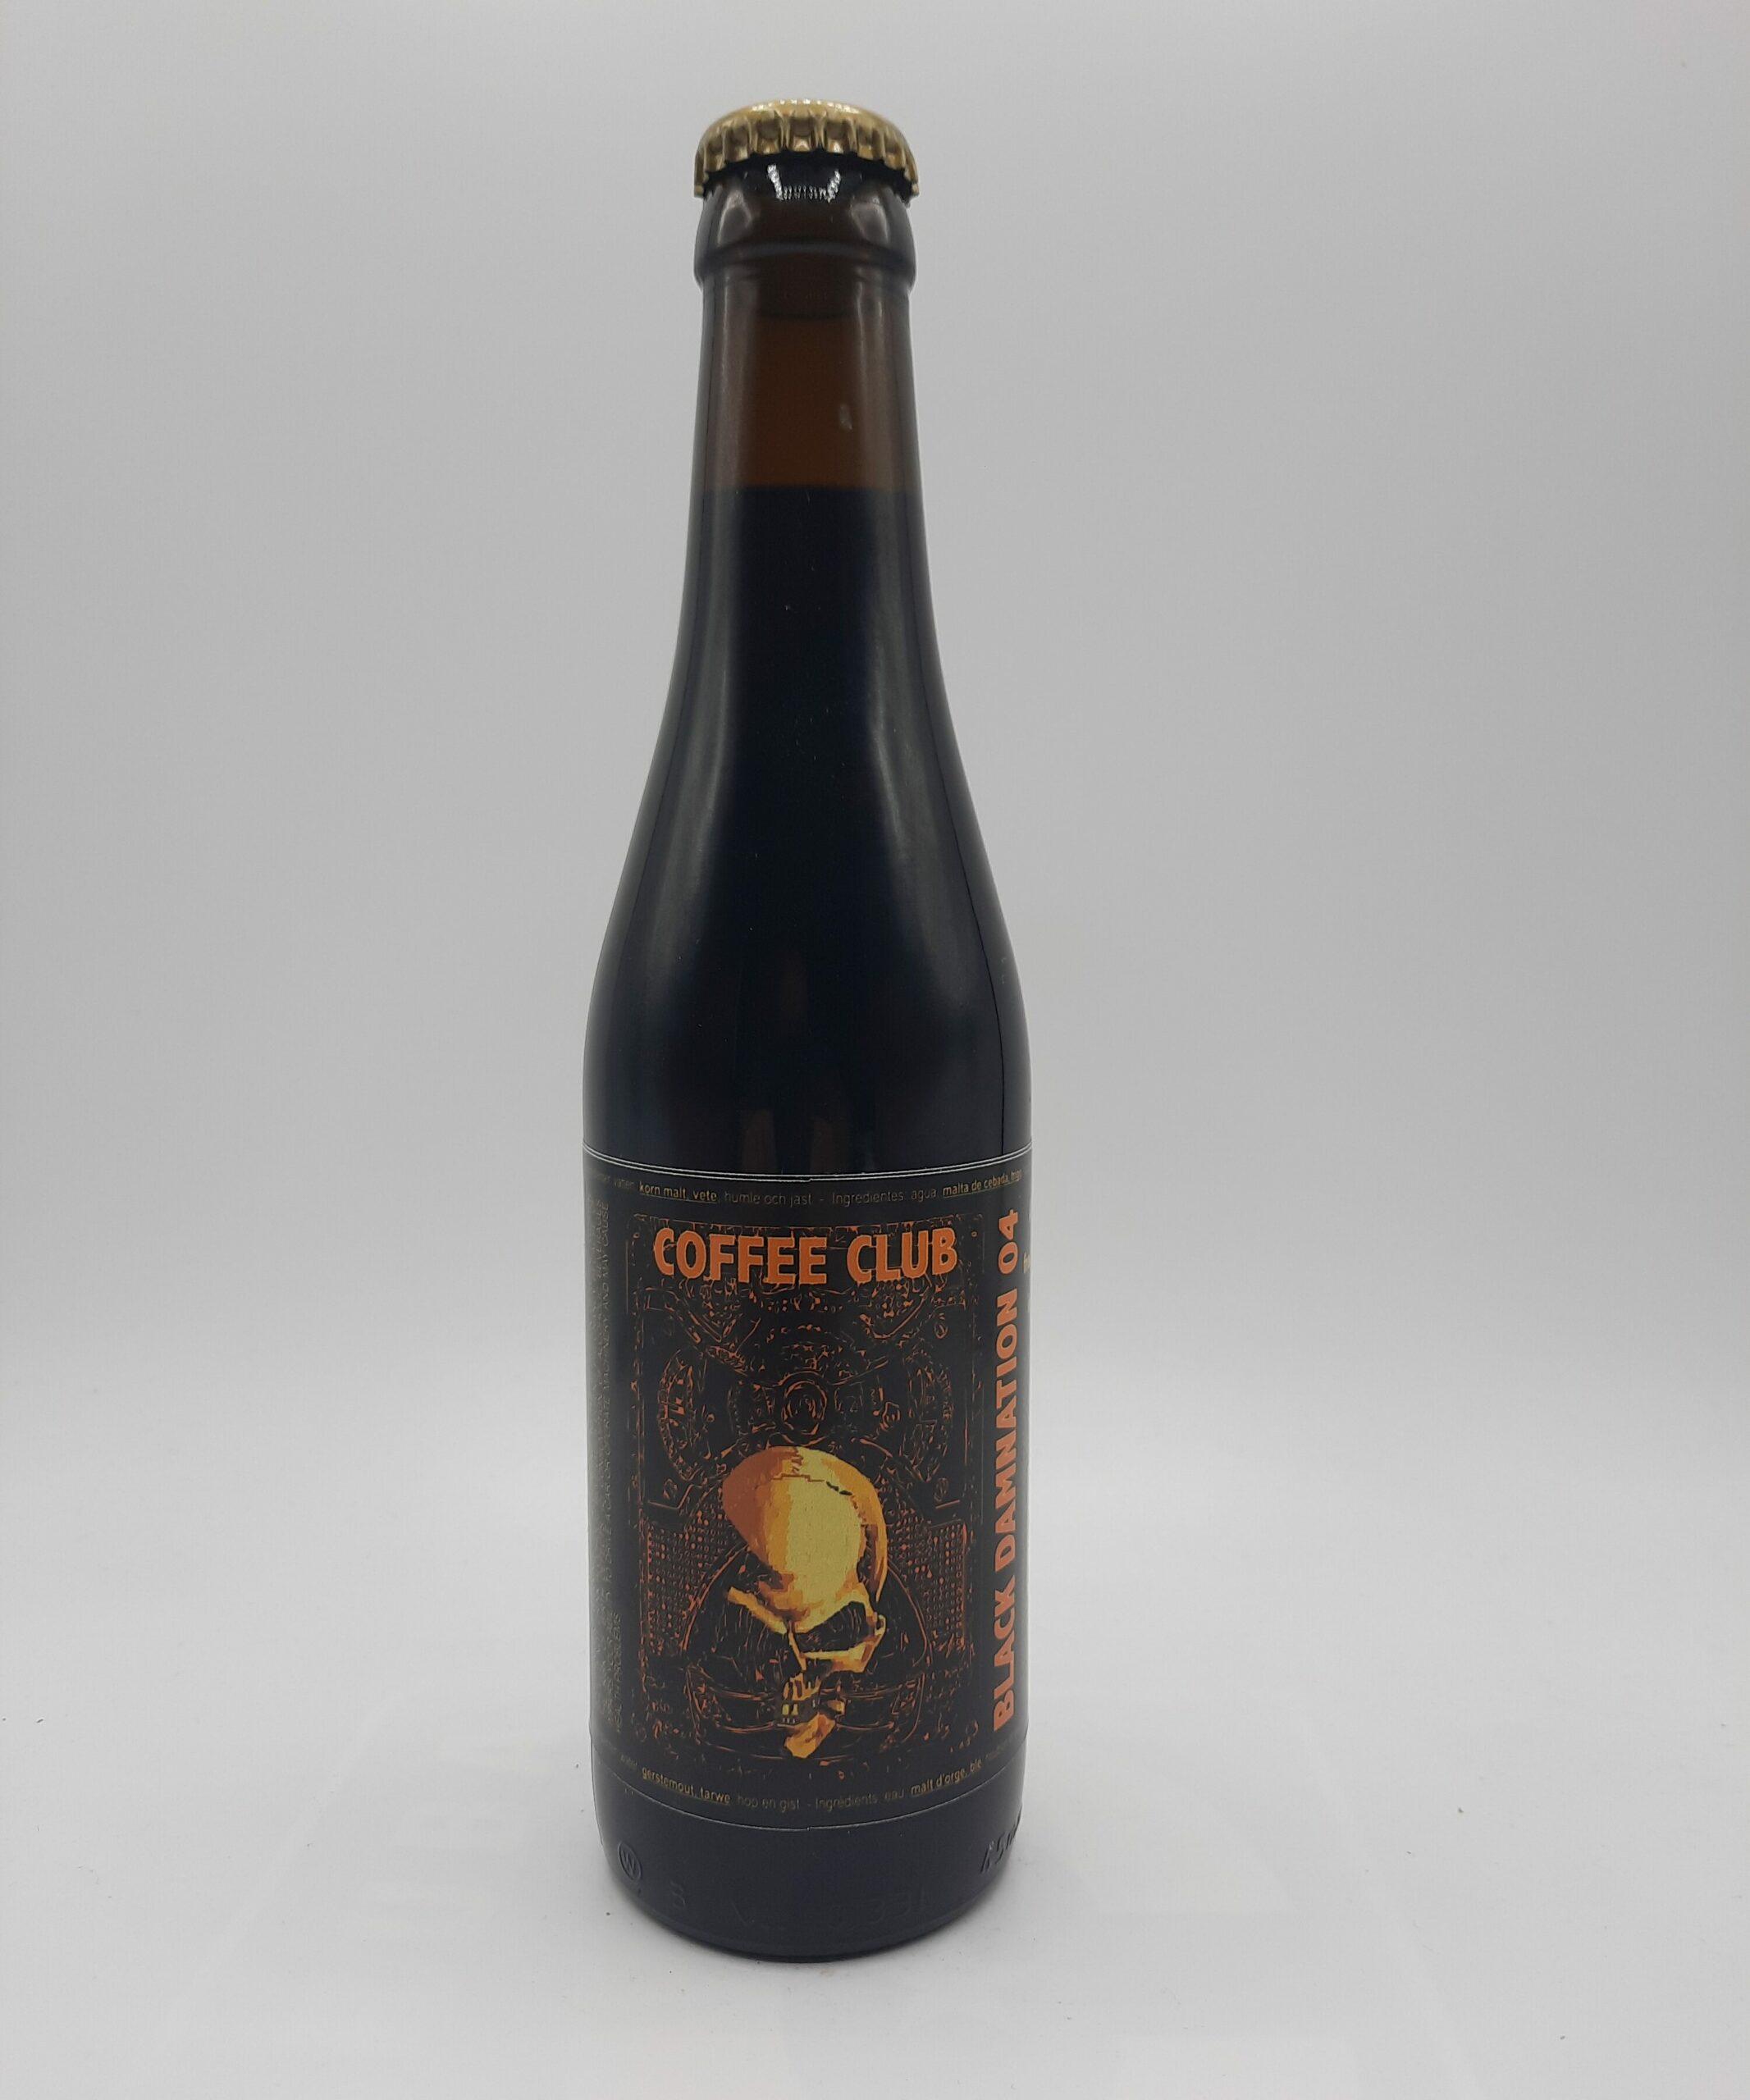 Struise | Black Damnation 04 Coffee Club | Caribbean Rum Barrel Aged Imperial Stout 13% 330ml